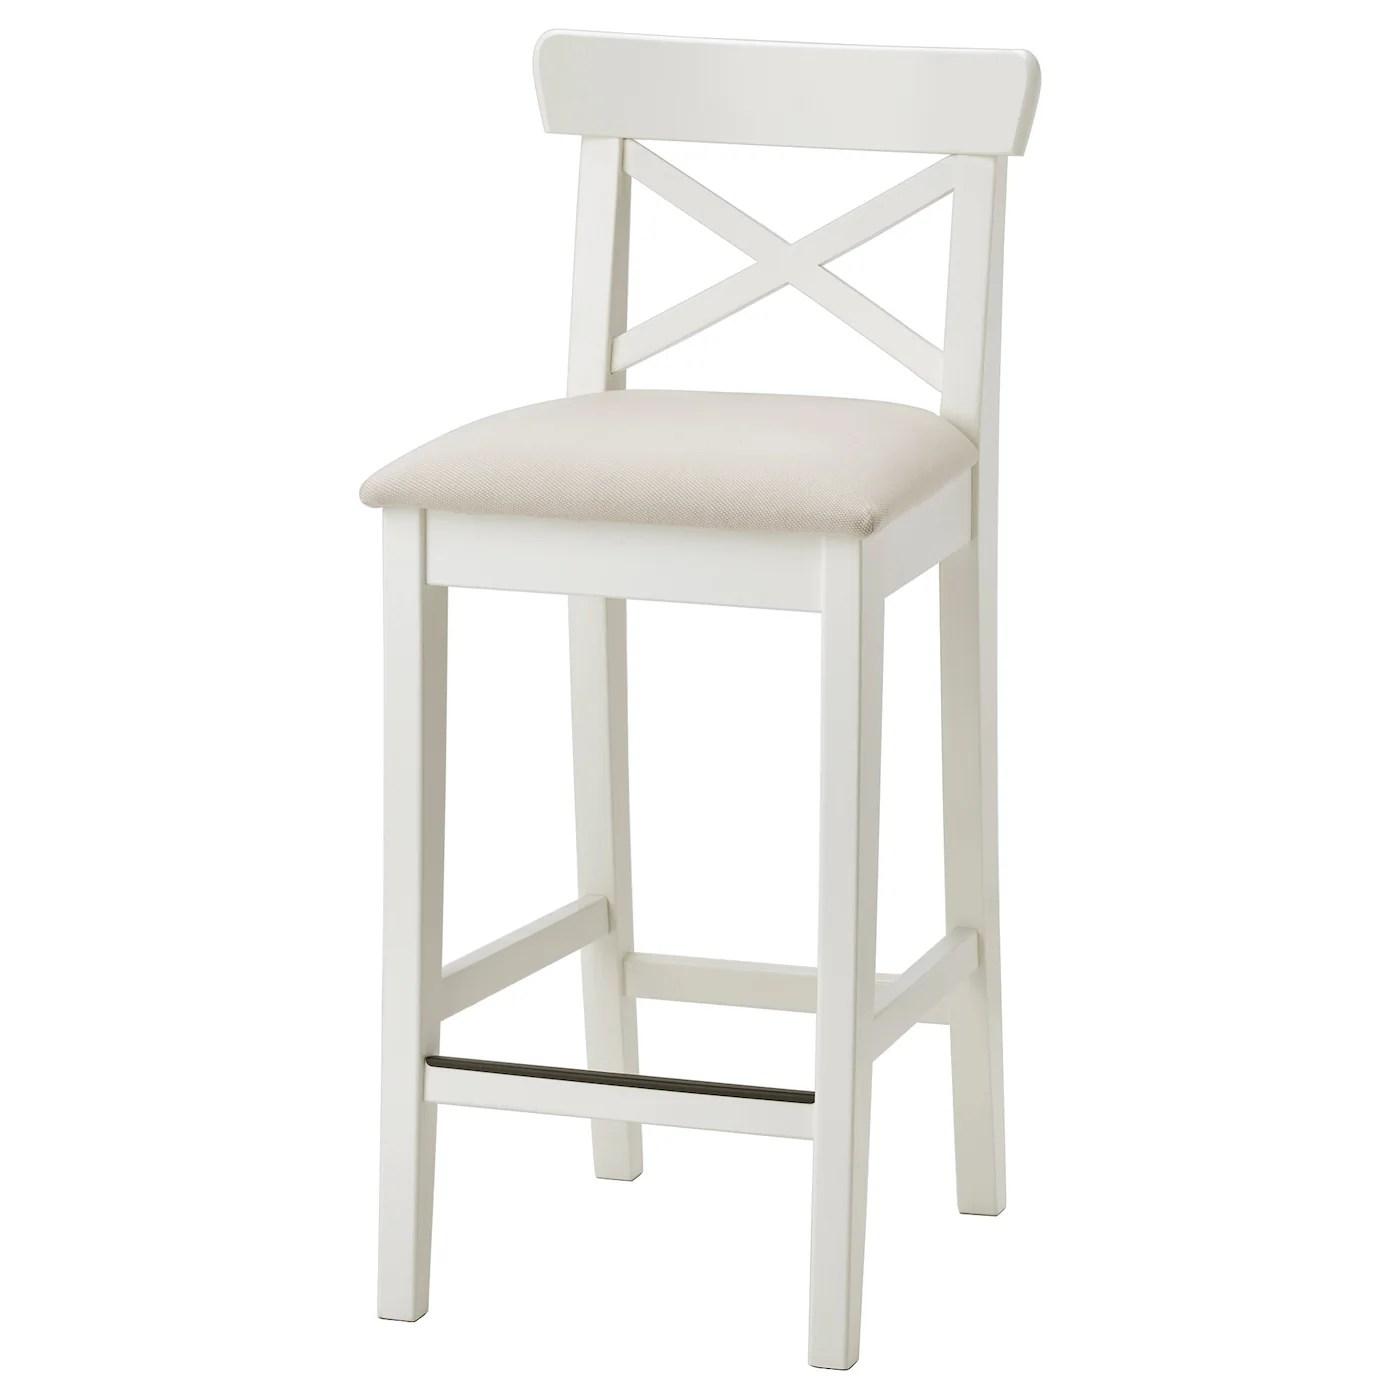 Ingolf Chaise De Bar Blanc Hallarp Beige 65 Cm Ikea